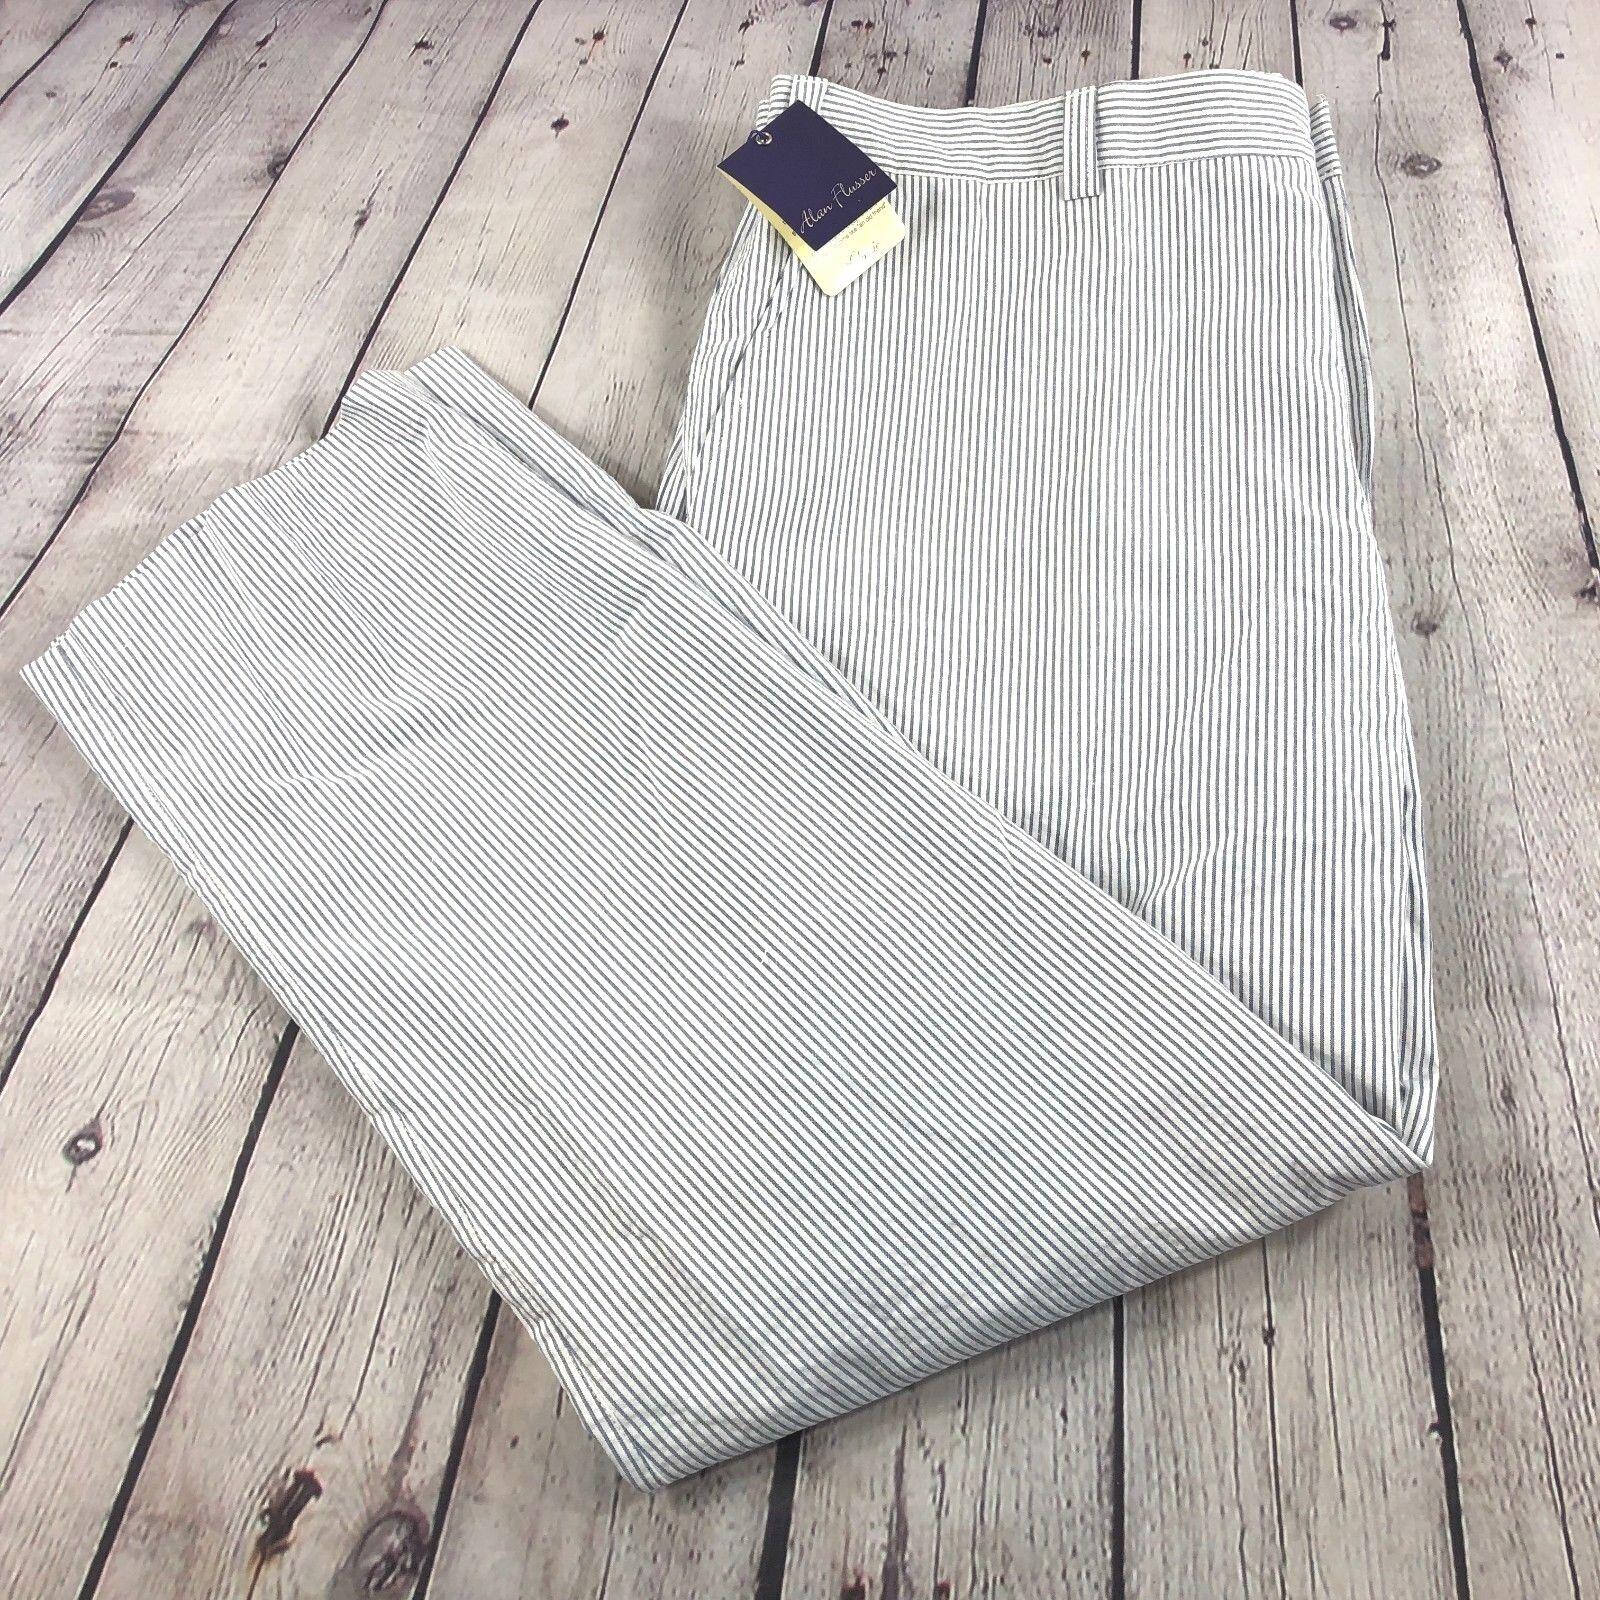 NWT Alan Flusser Men's bluee White Stripe 'Simon' Pants 100% Cotton Sz 40x30